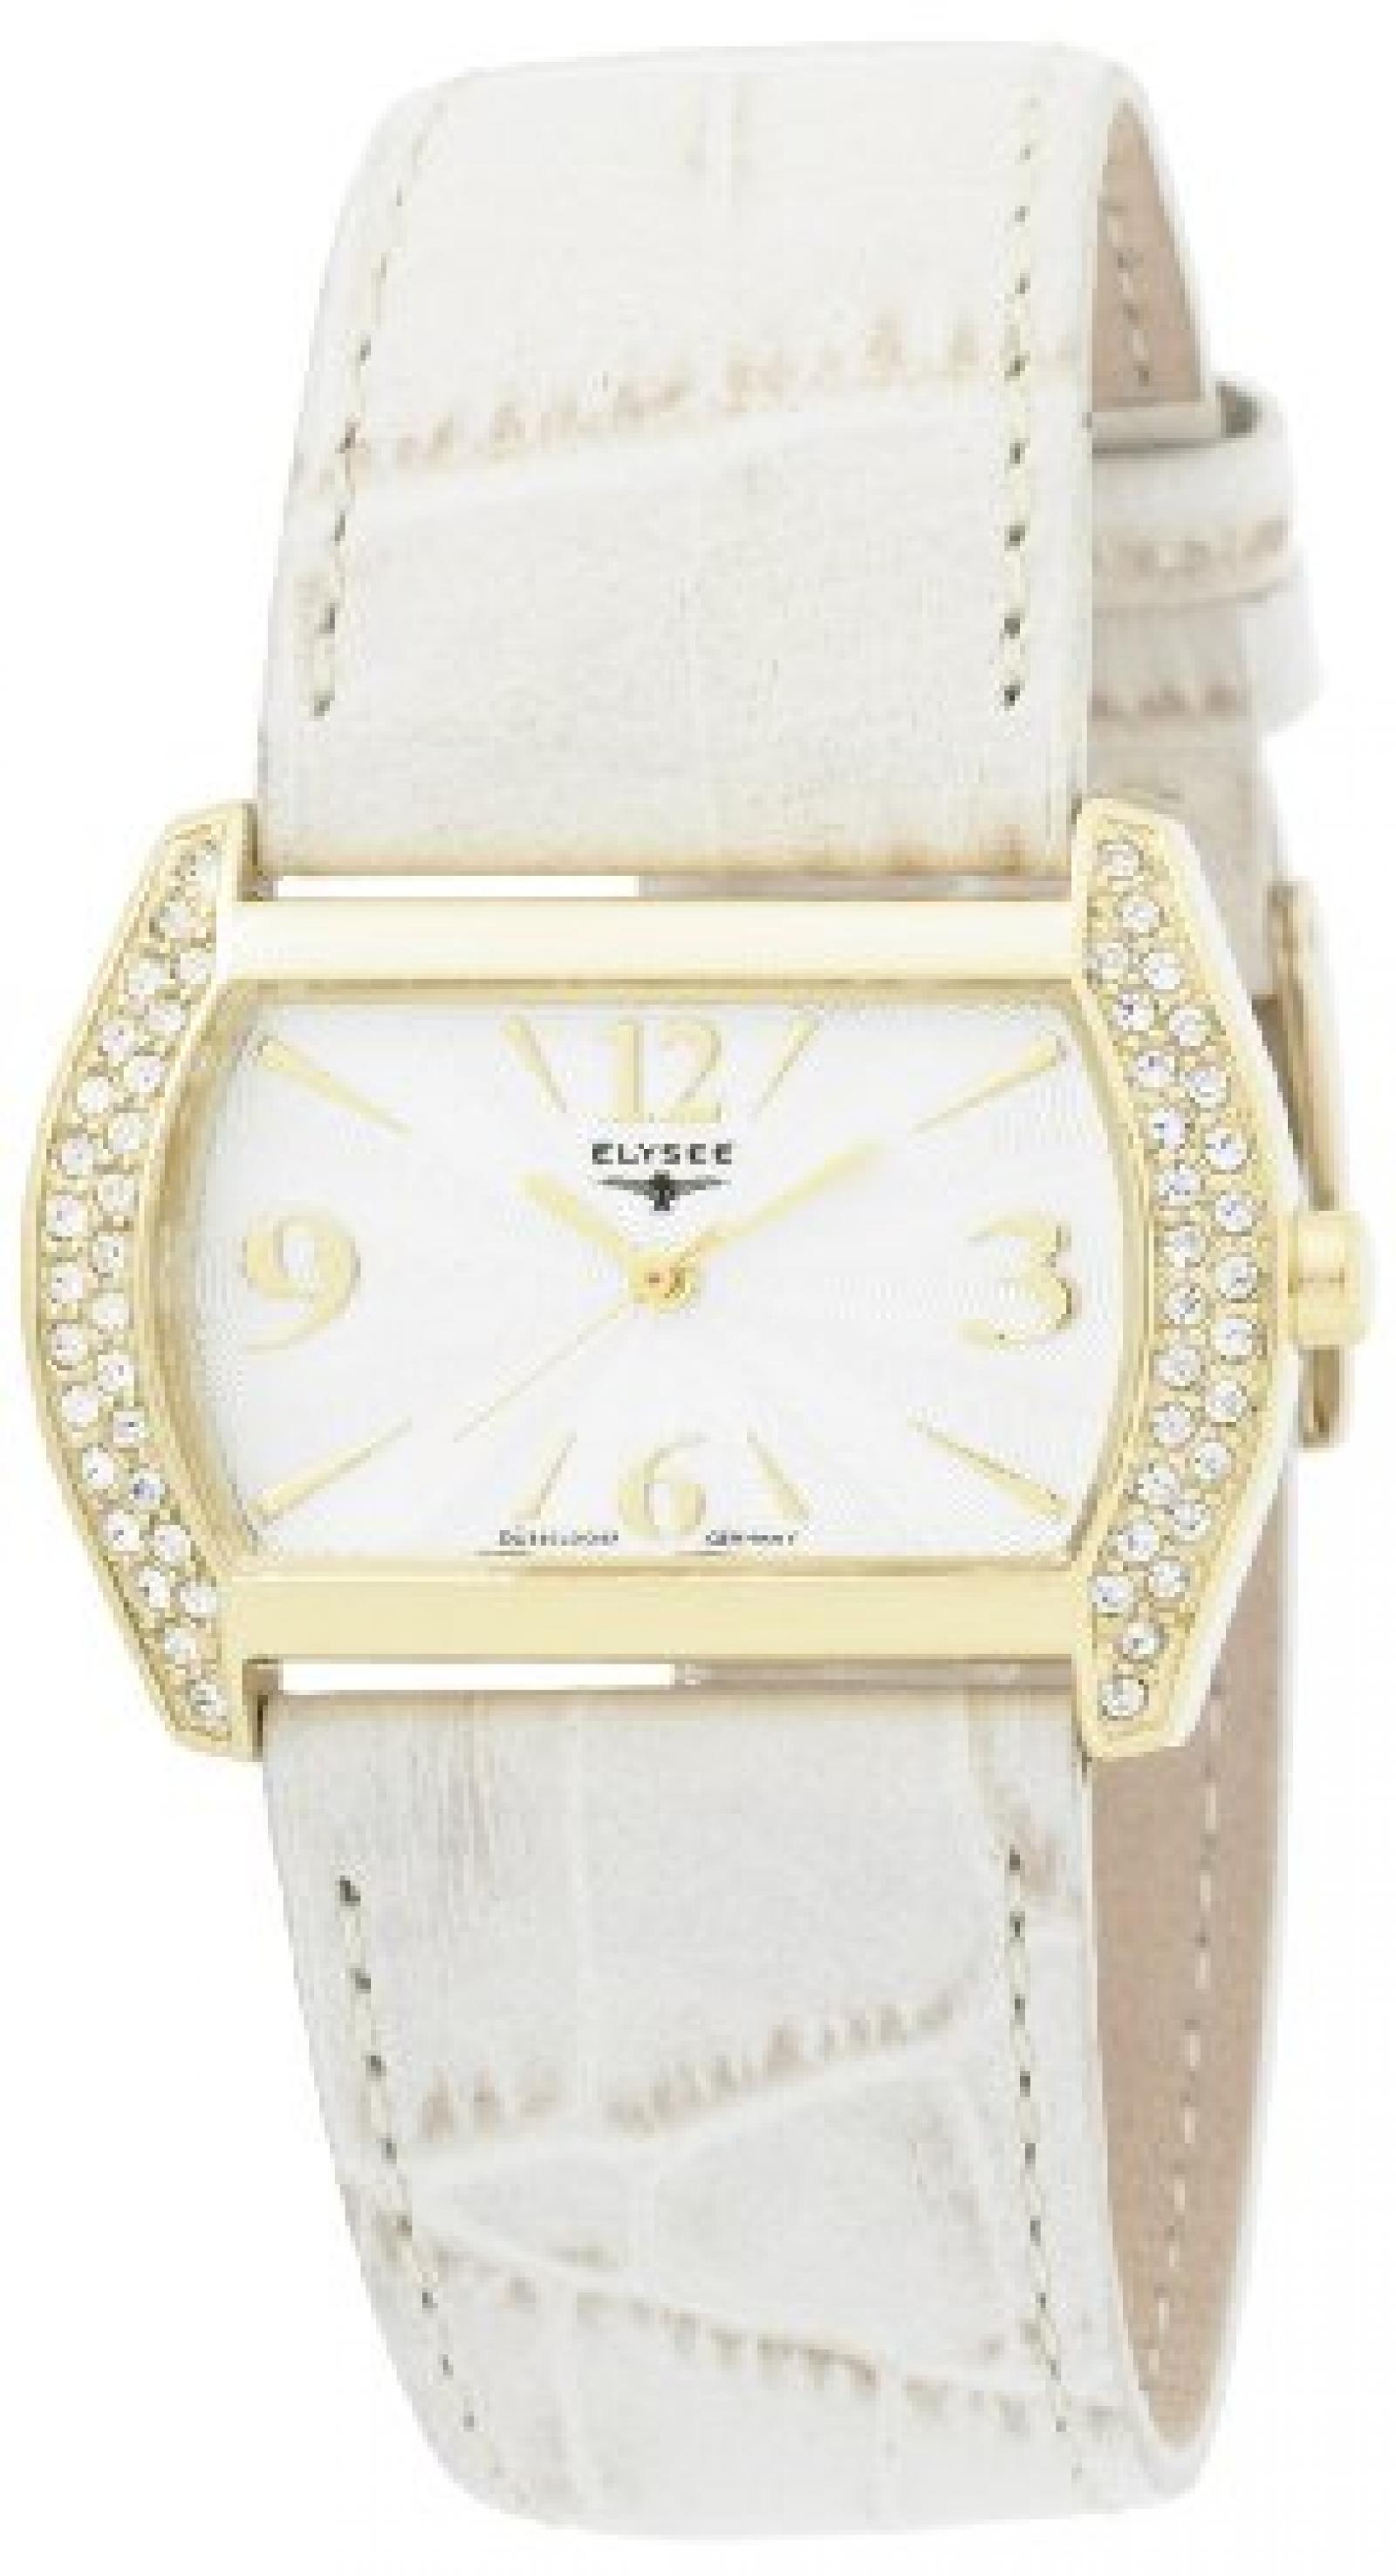 Elysee Damen-Armbanduhr Analog Leder 28334G